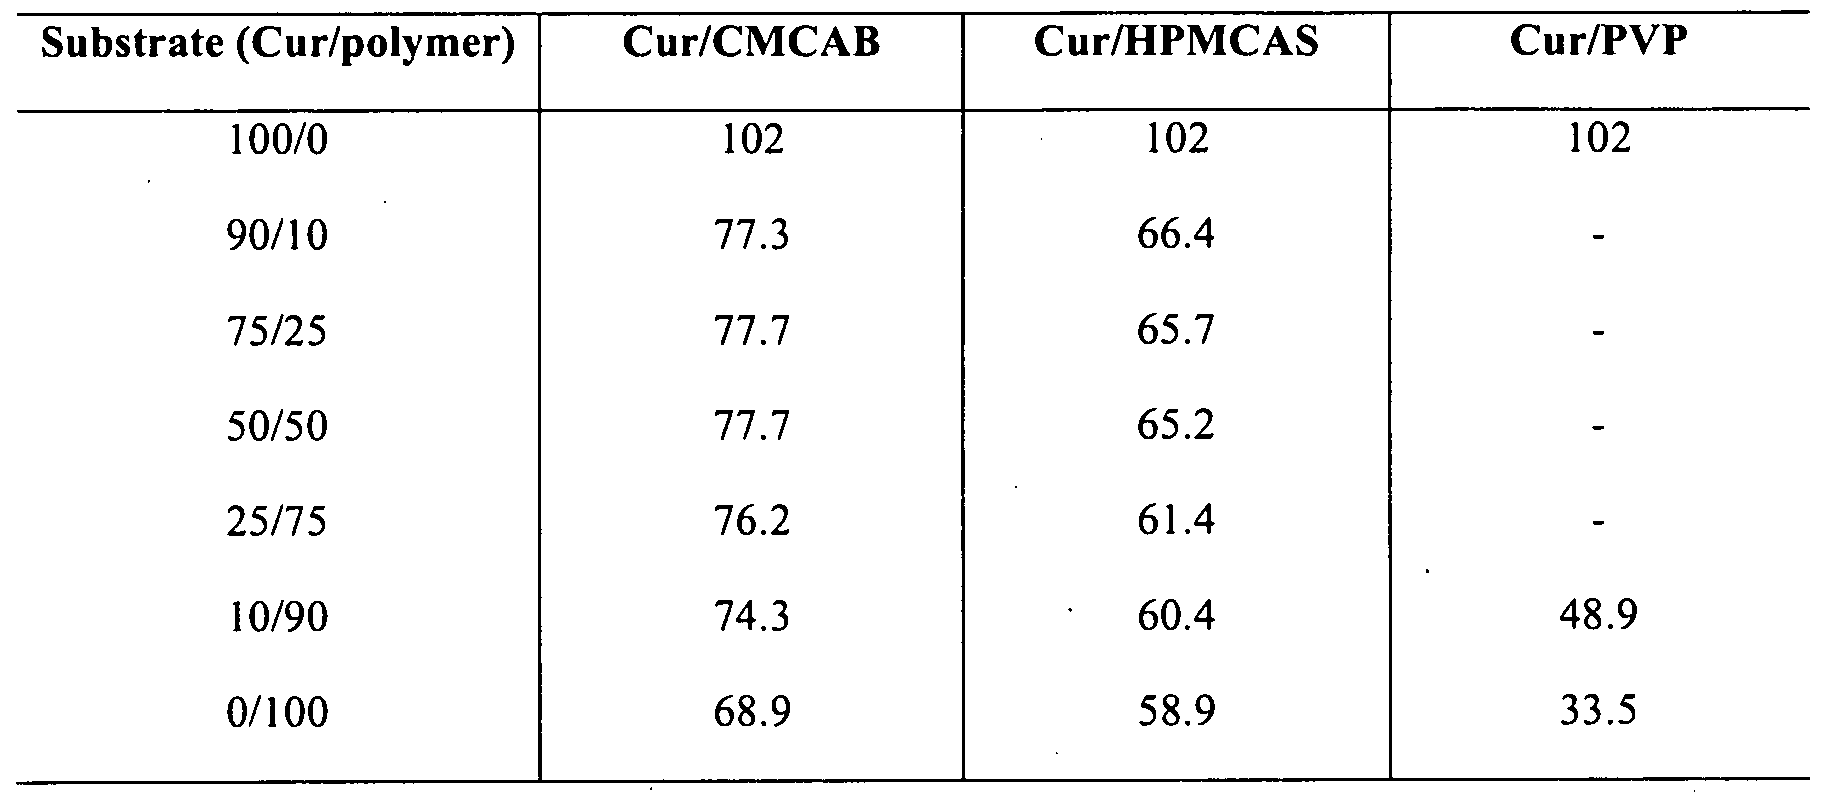 bcs class 2 anticancer drugs